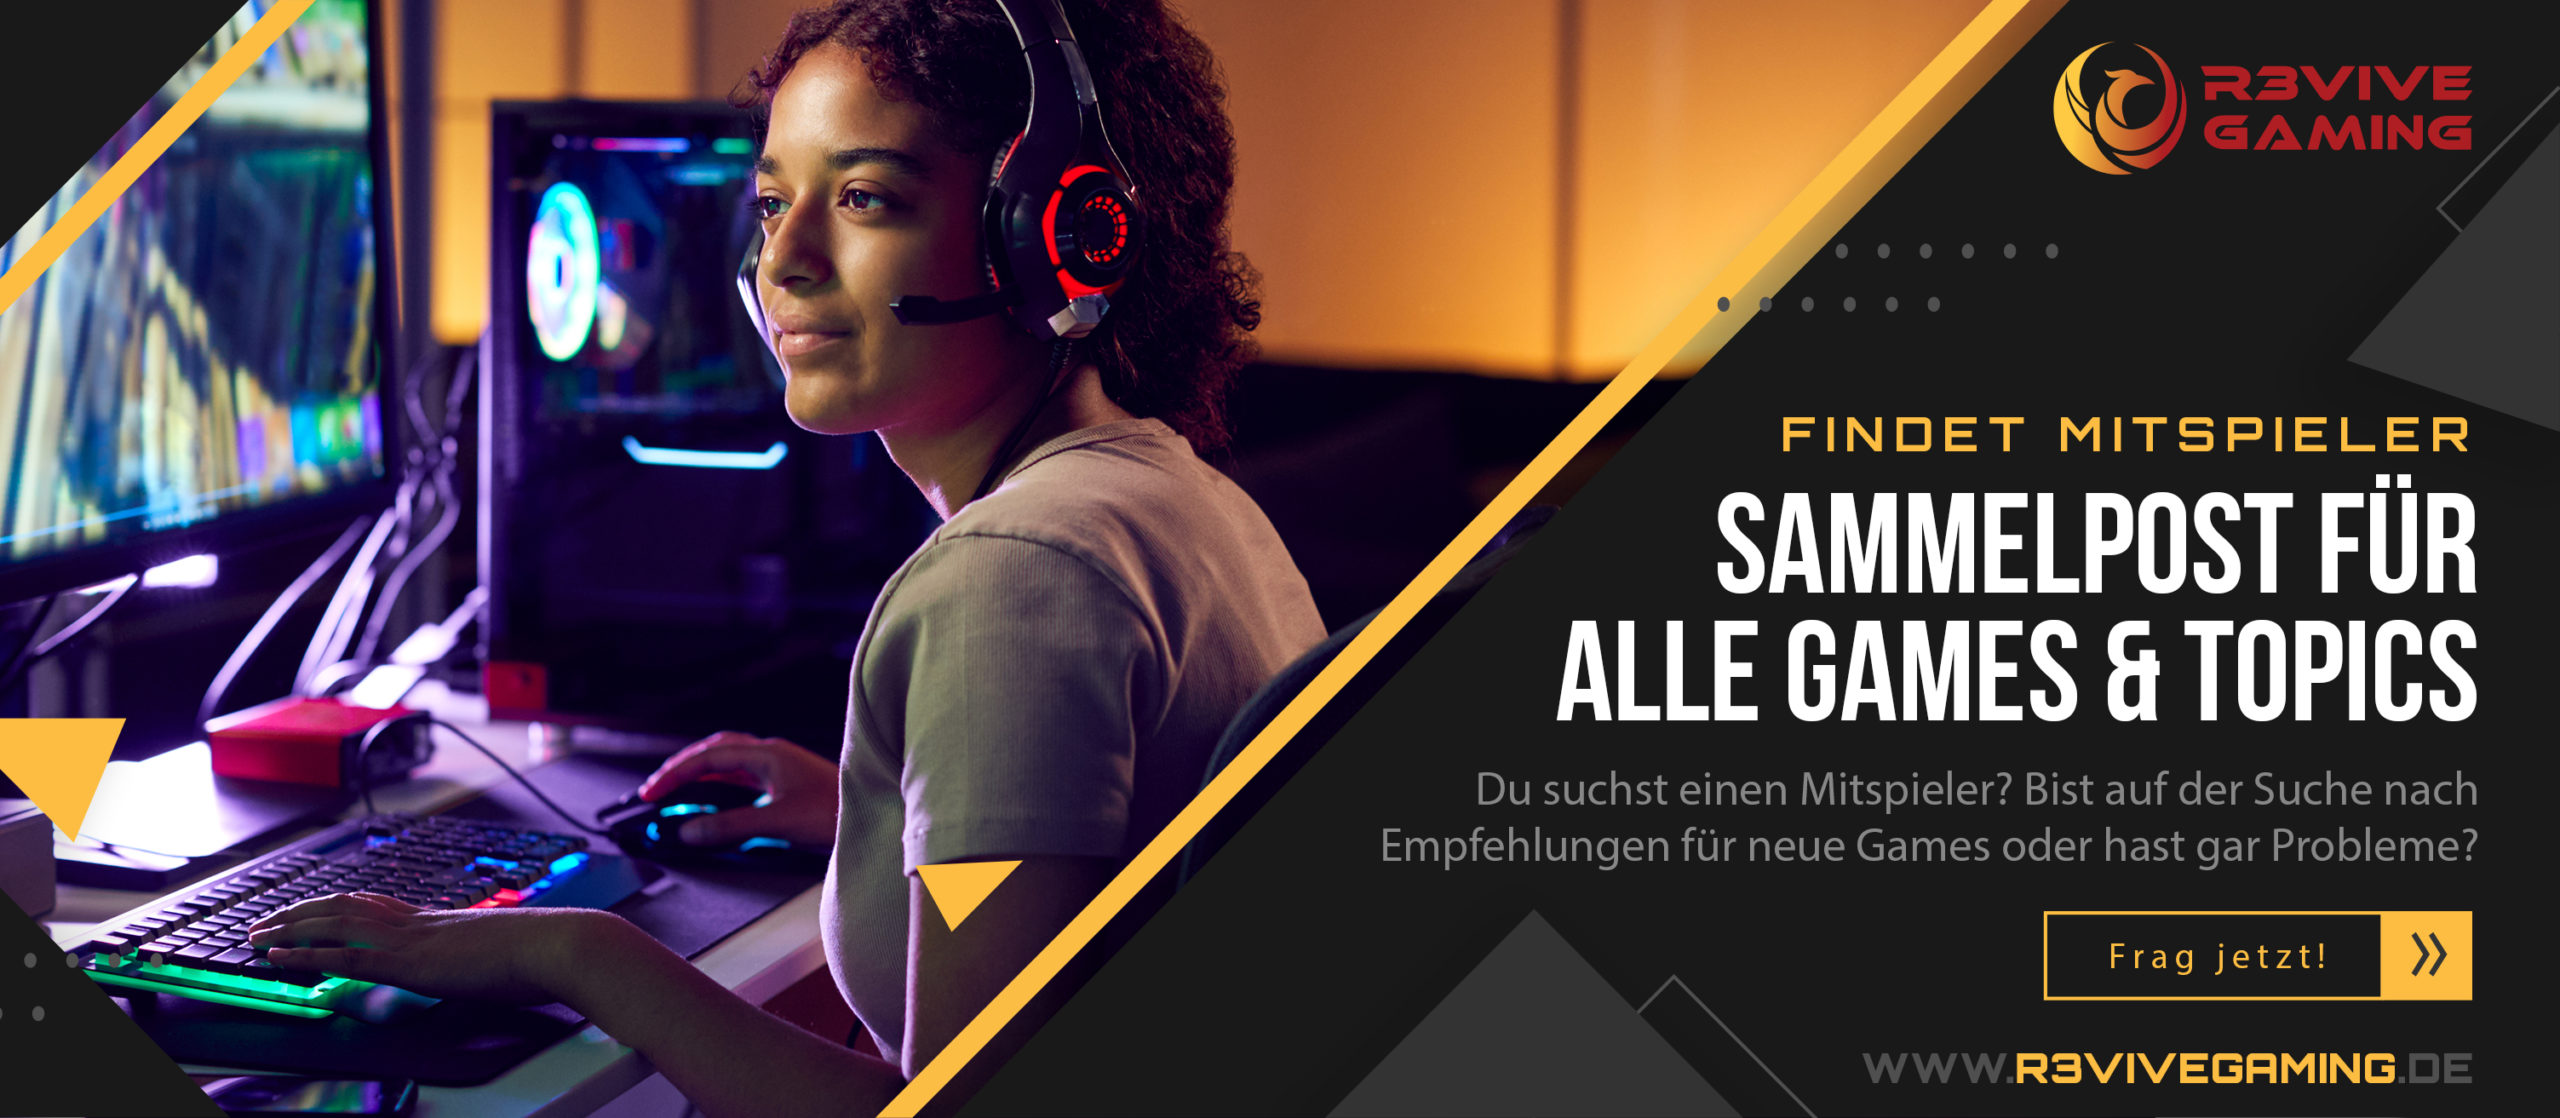 3 01 scaled » Streamer » Gaming Homepage » Logo Design